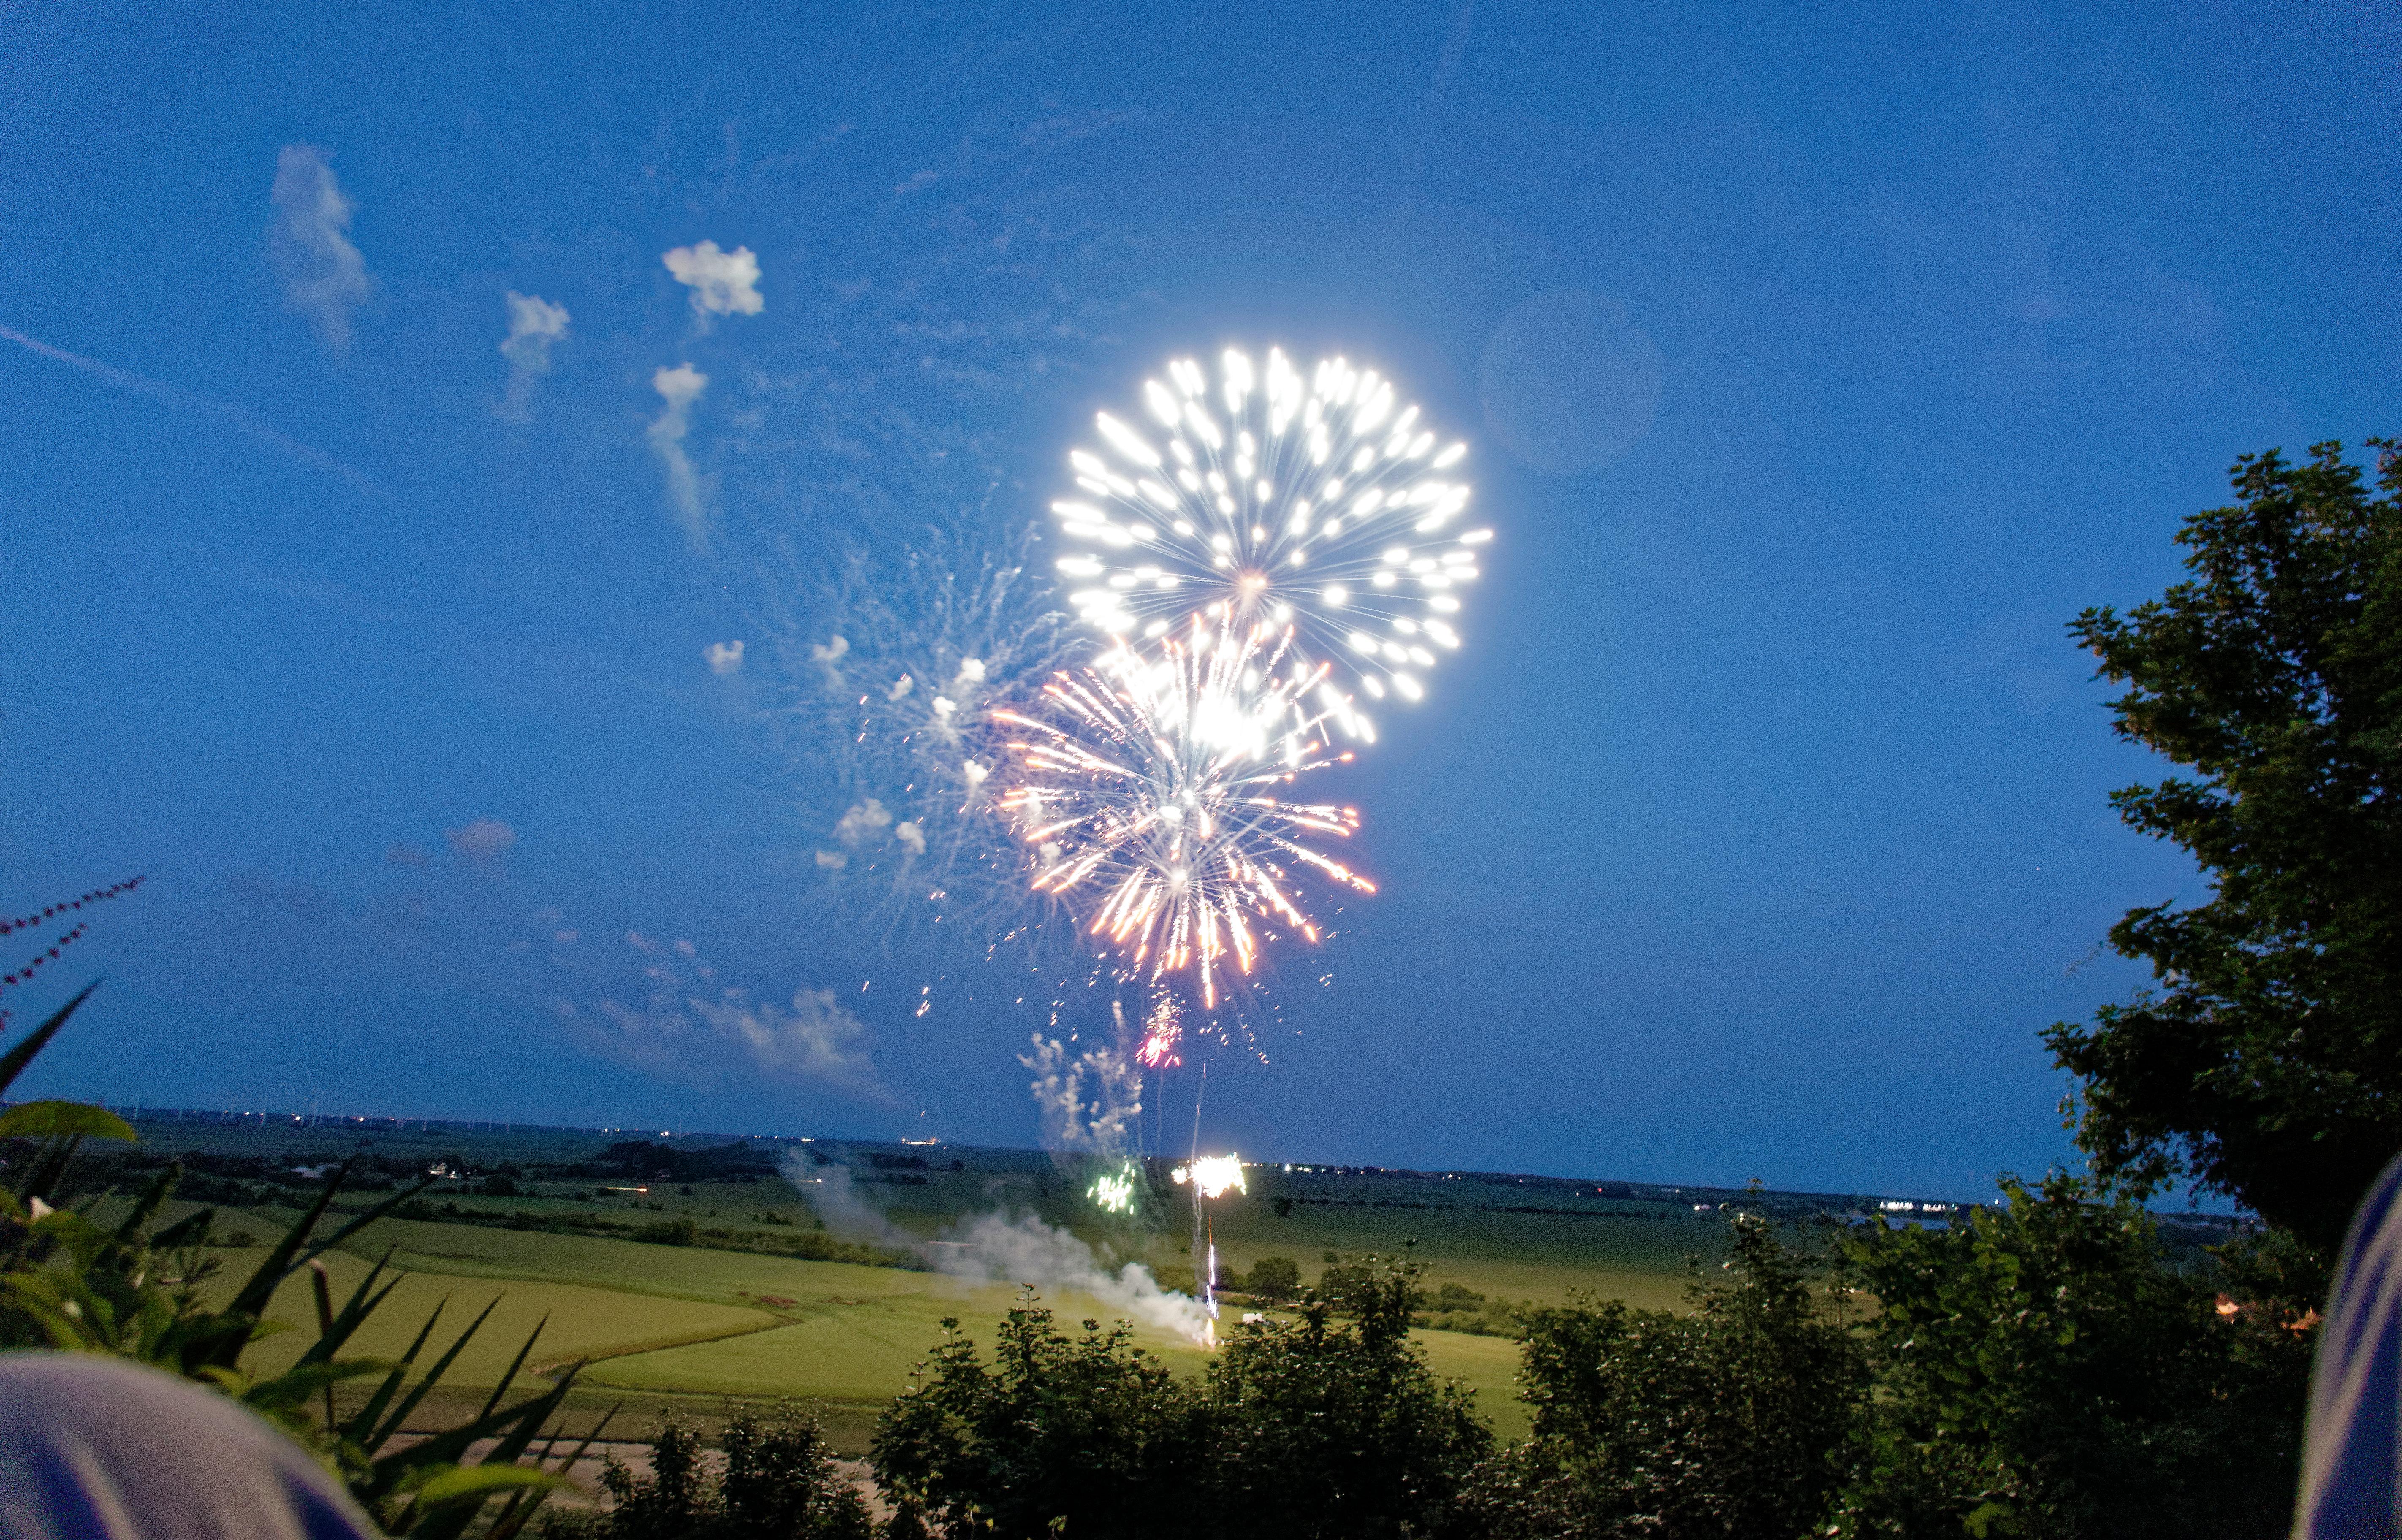 Wedding Fireworks in East Sussex